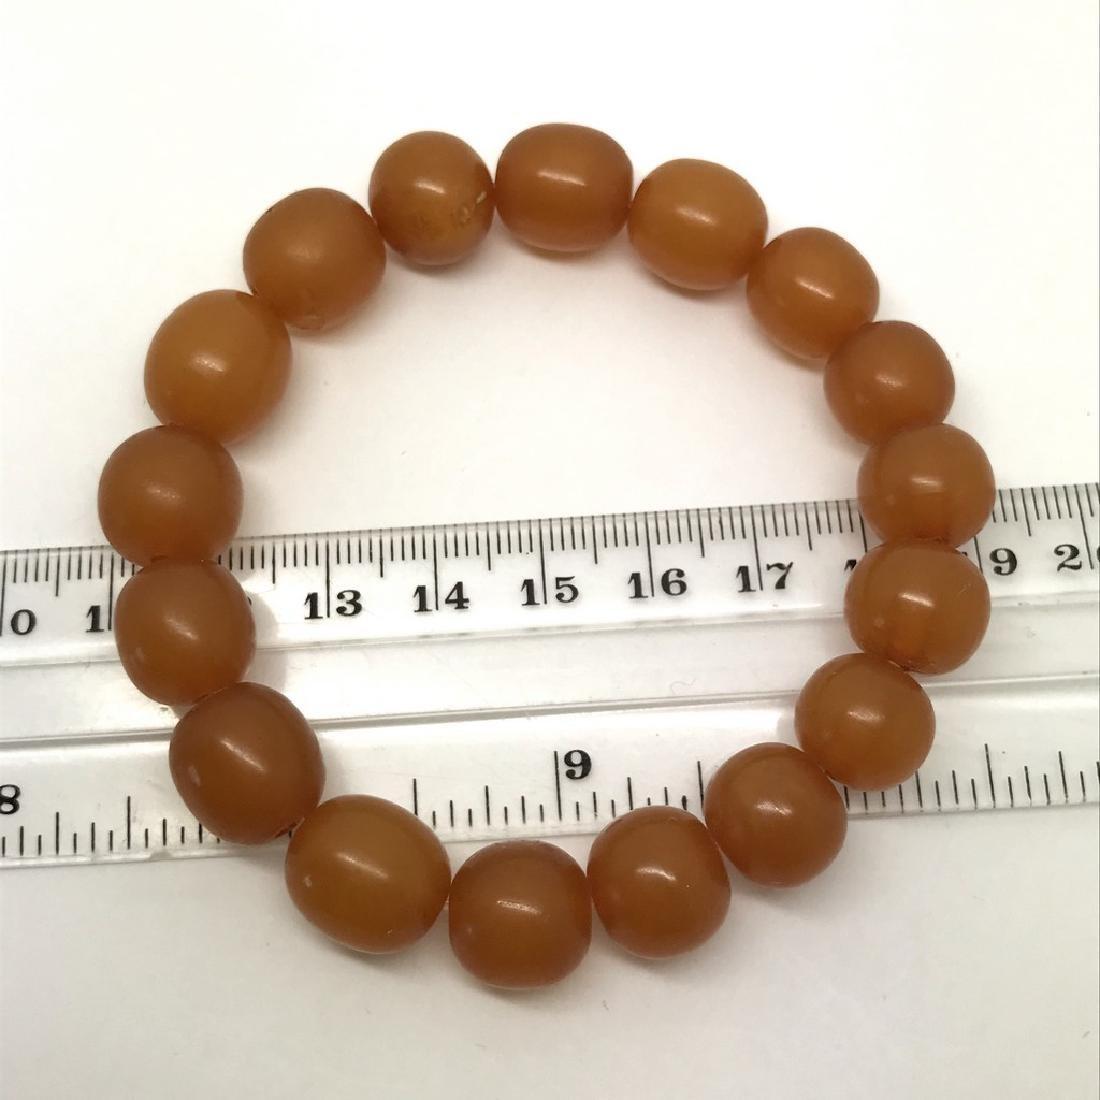 Vintage bracelet Baltic amber butterscotch beads - 4